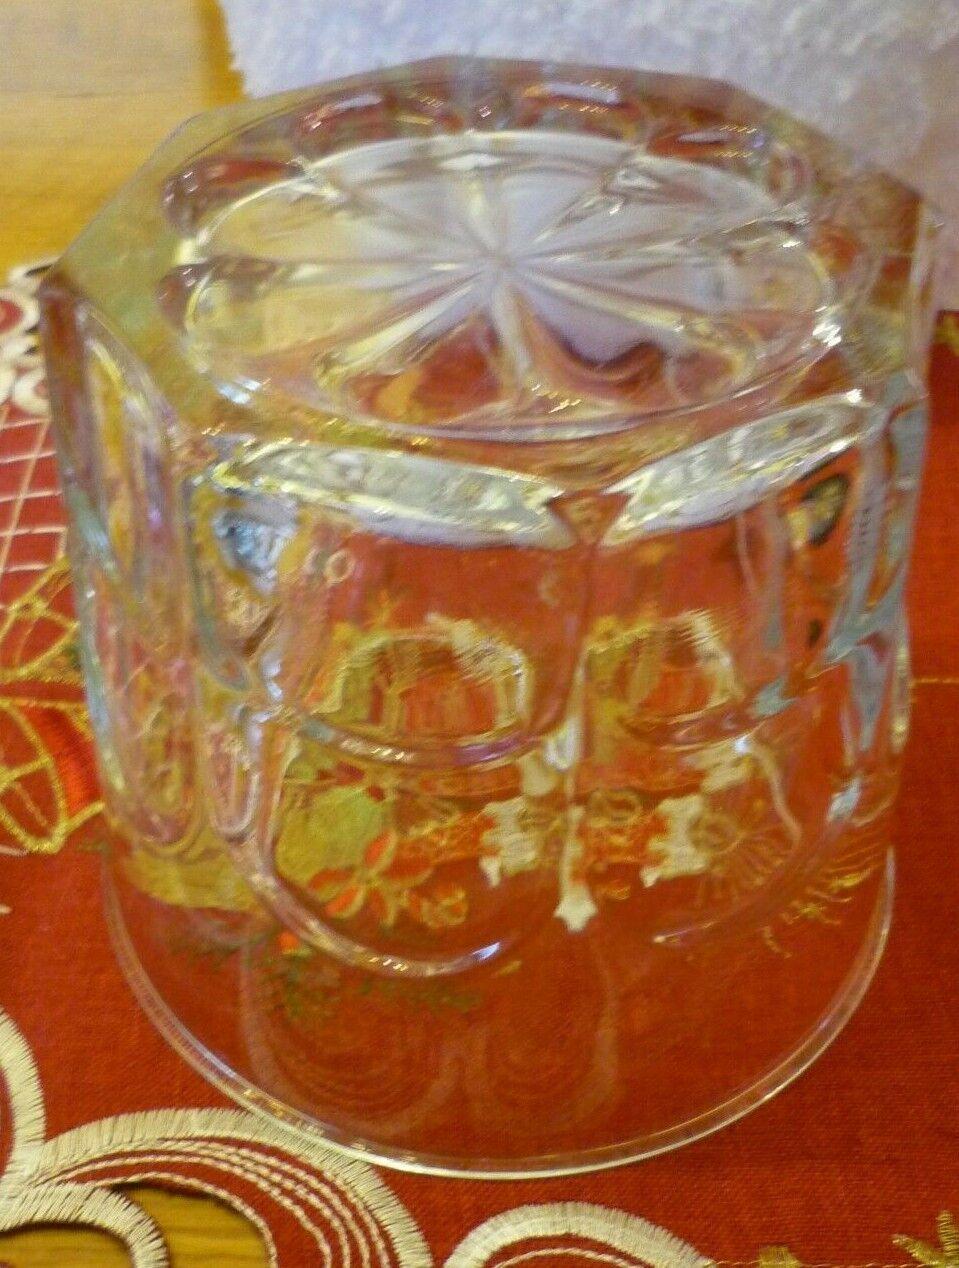 Seau a glacons en verre vintage pince a glacons glace ice cube glass bucket